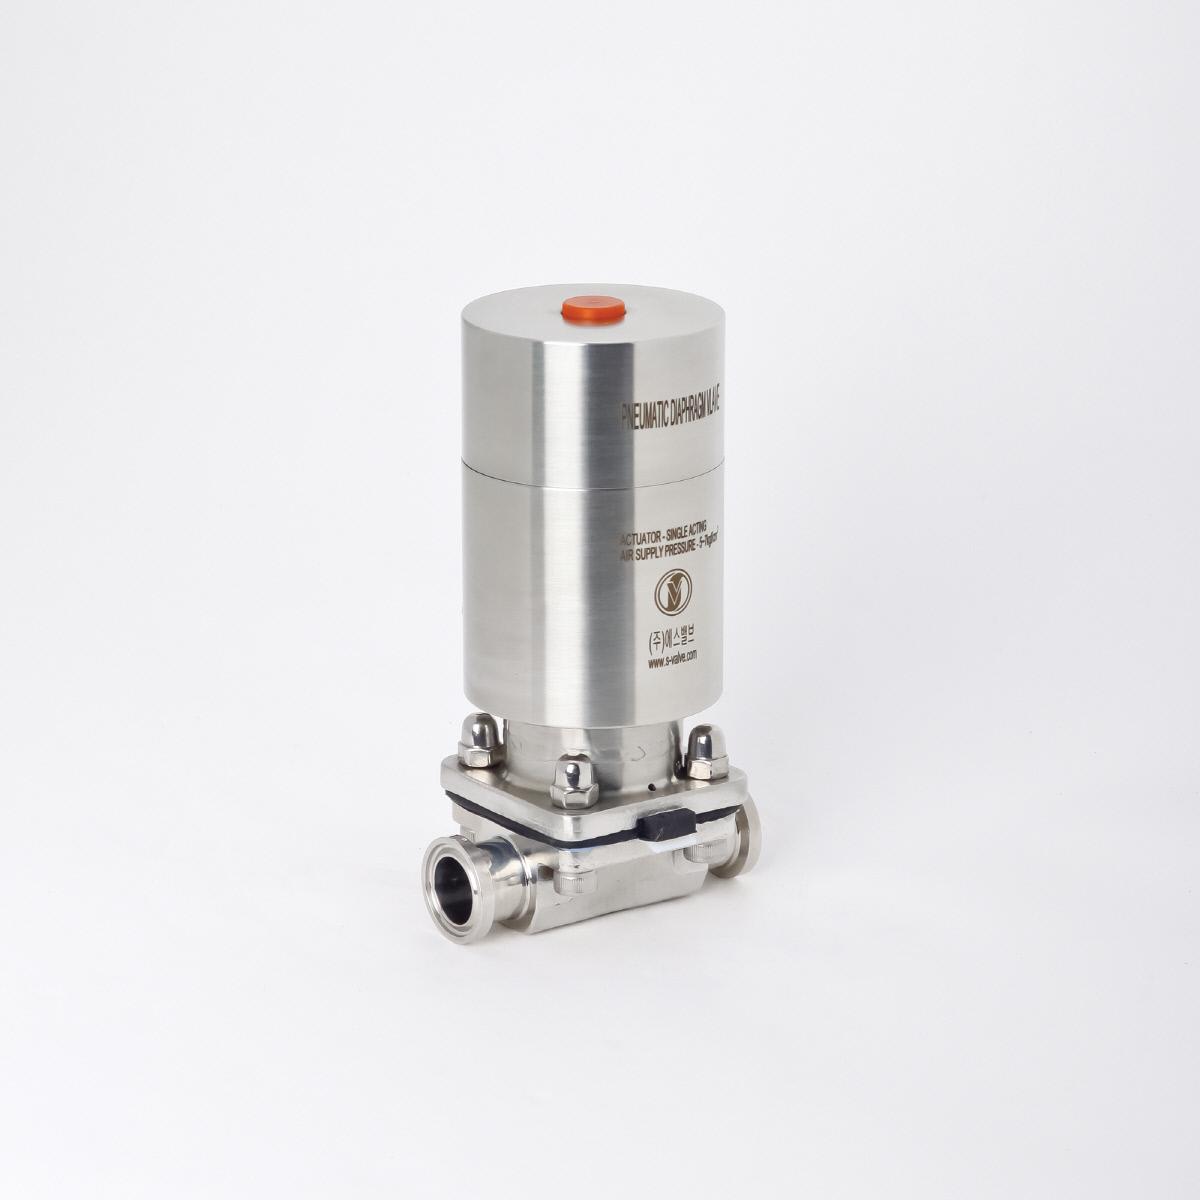 S-valve_0028.jpg